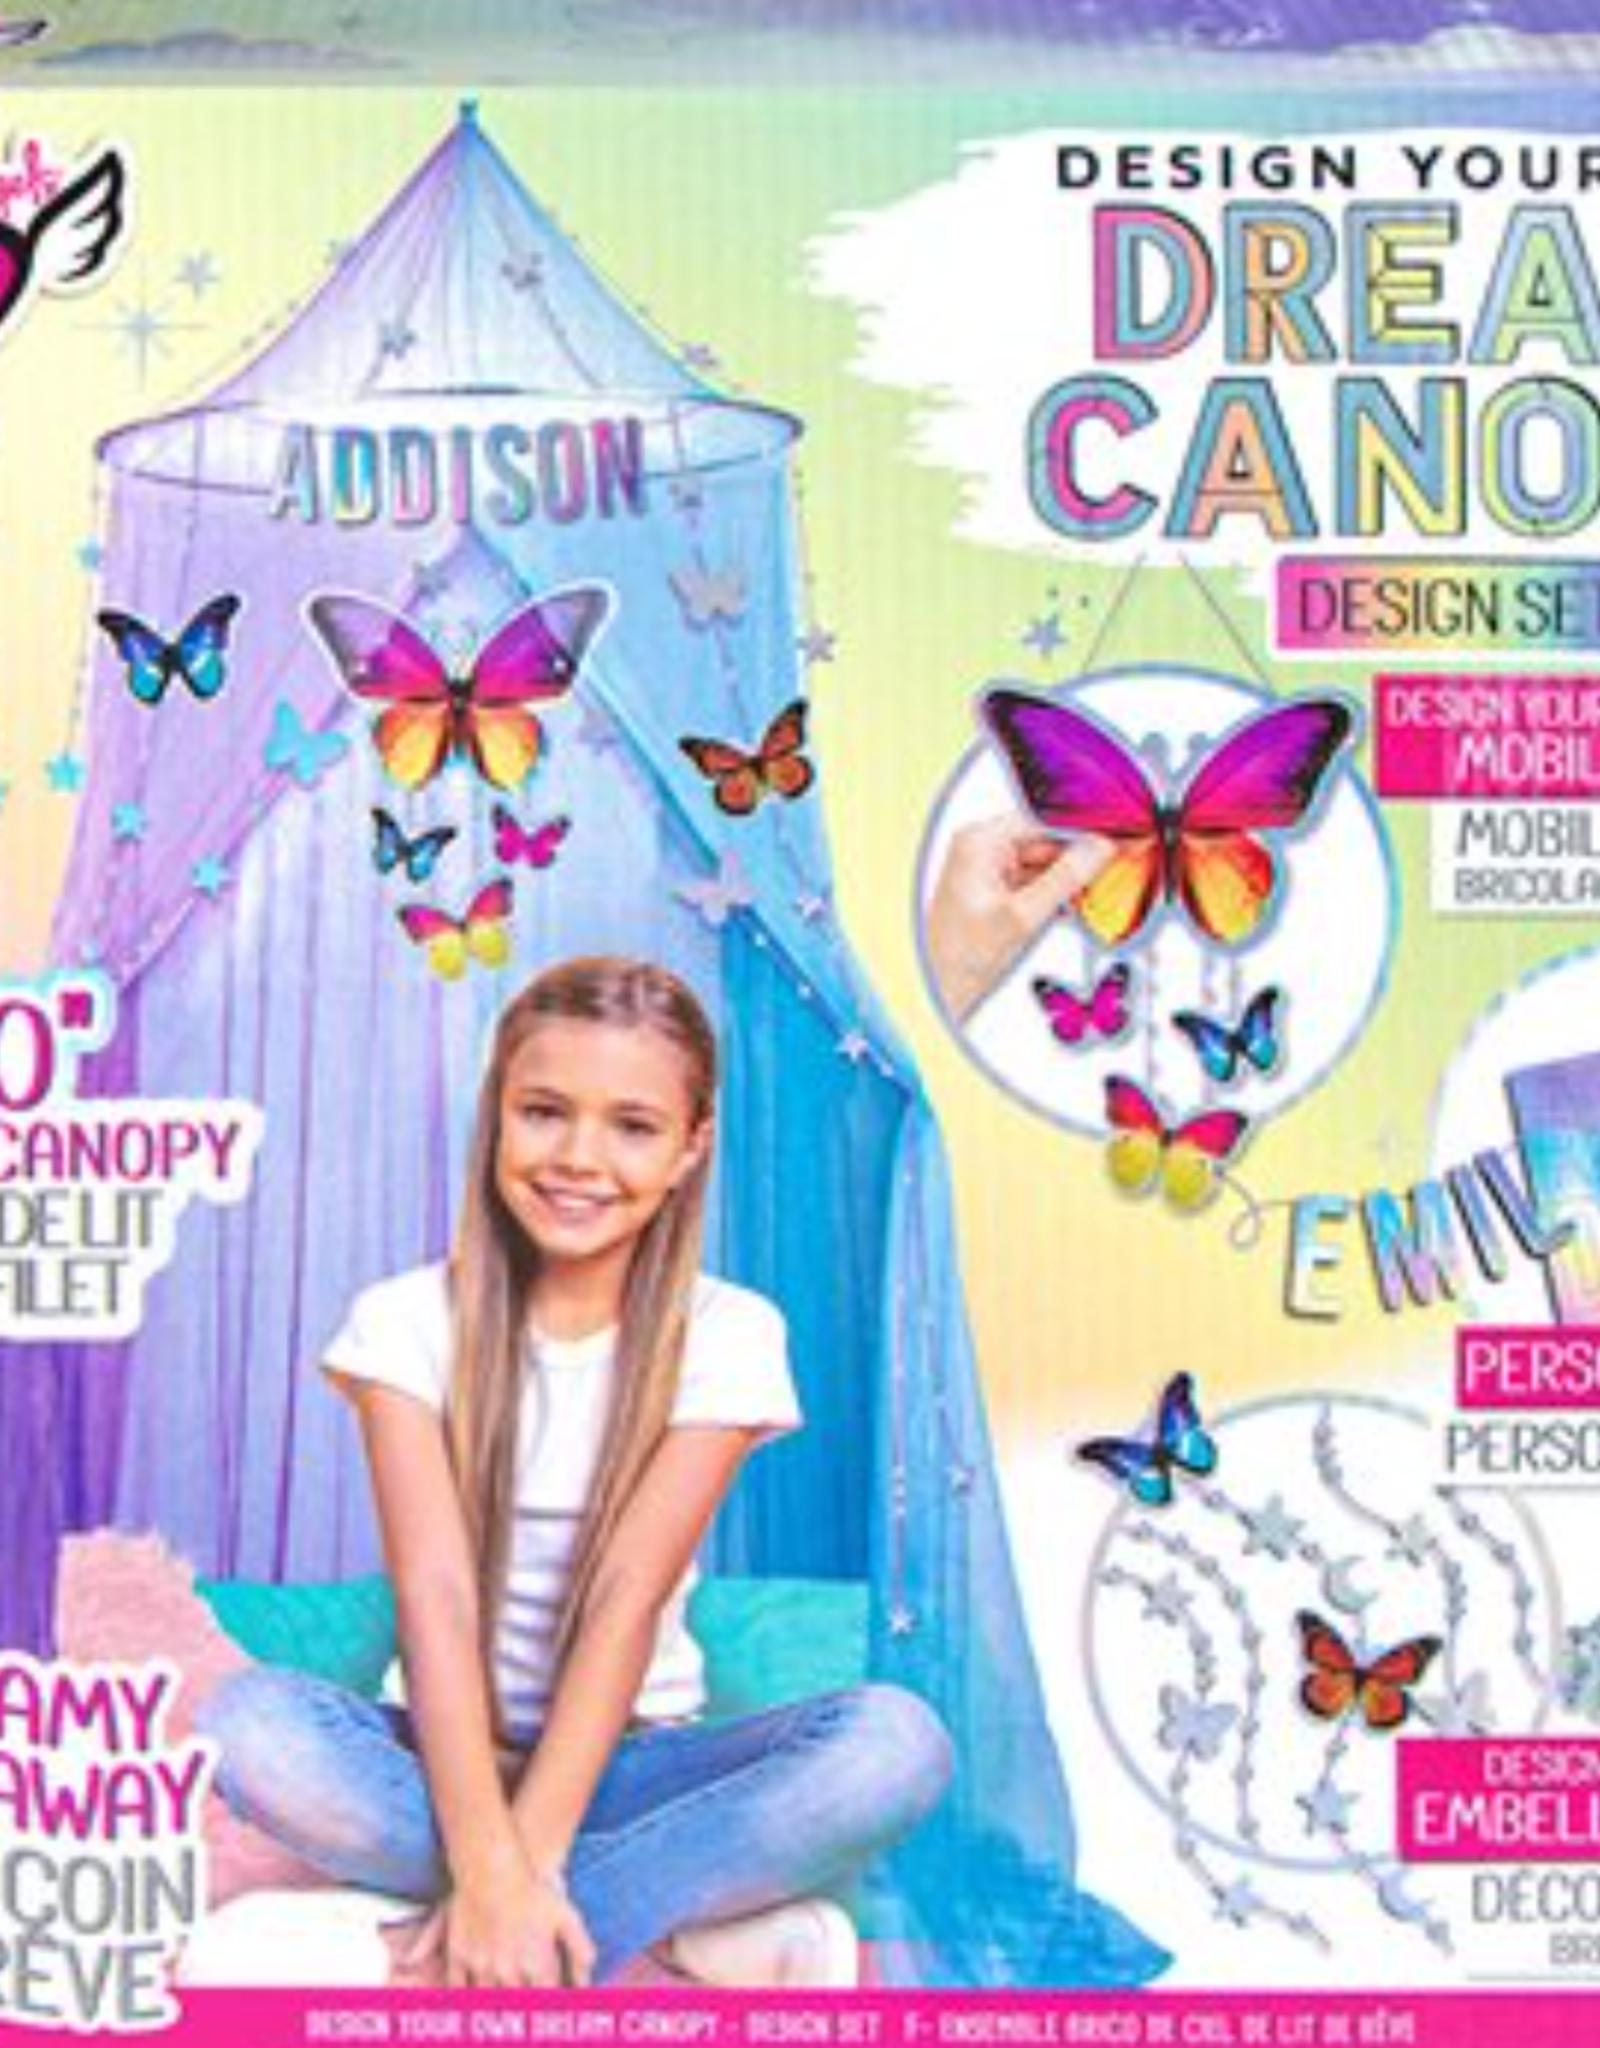 Design Your Own Dream Canopy Design Set